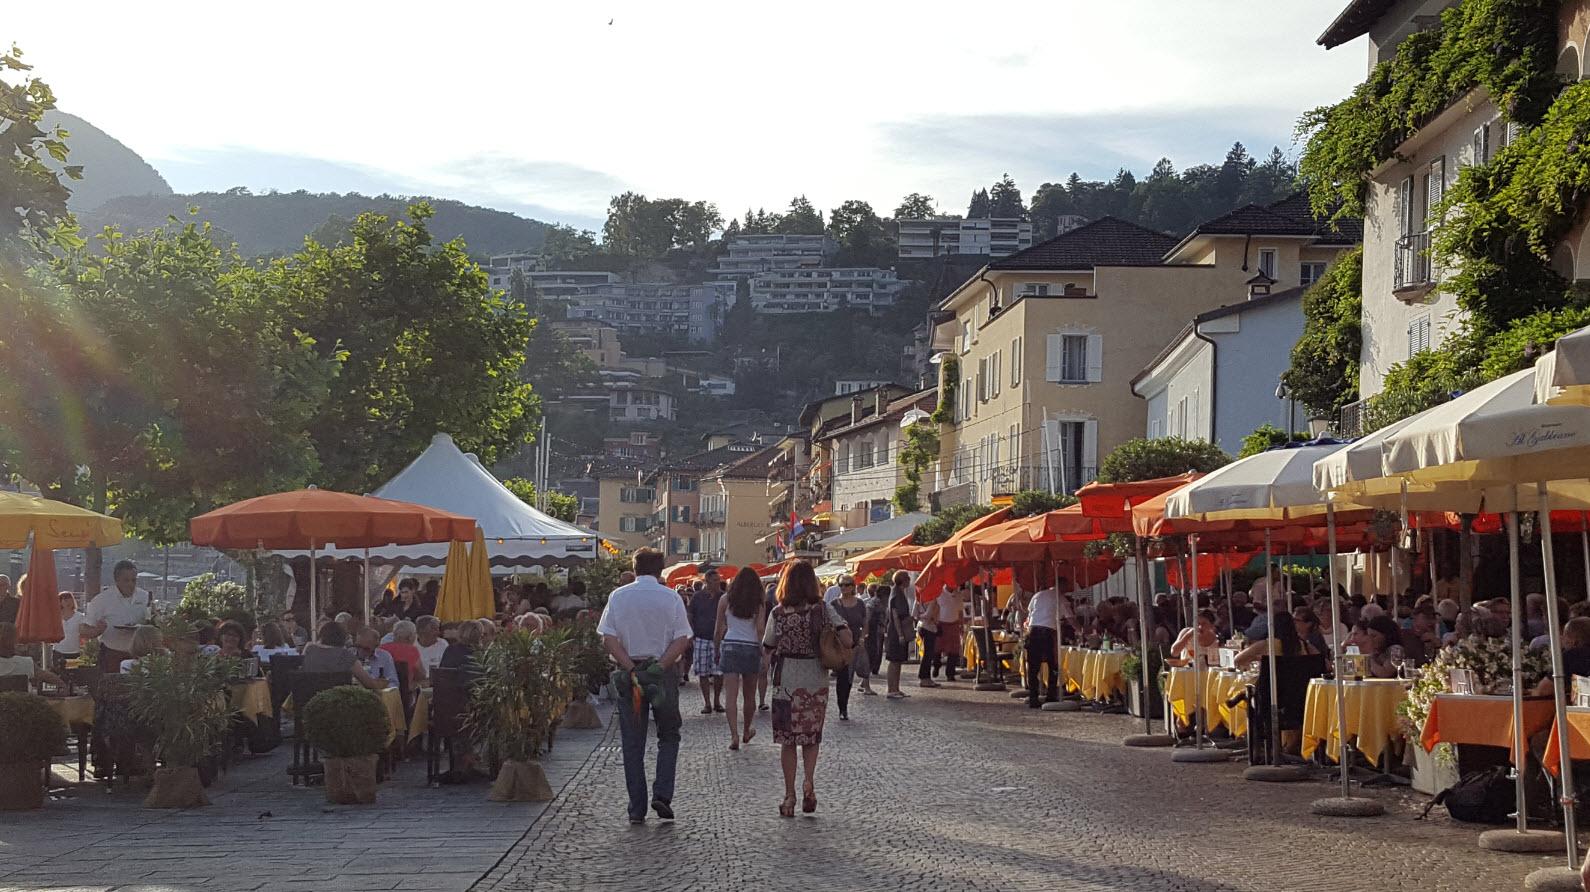 Festival de jazz a Ascona